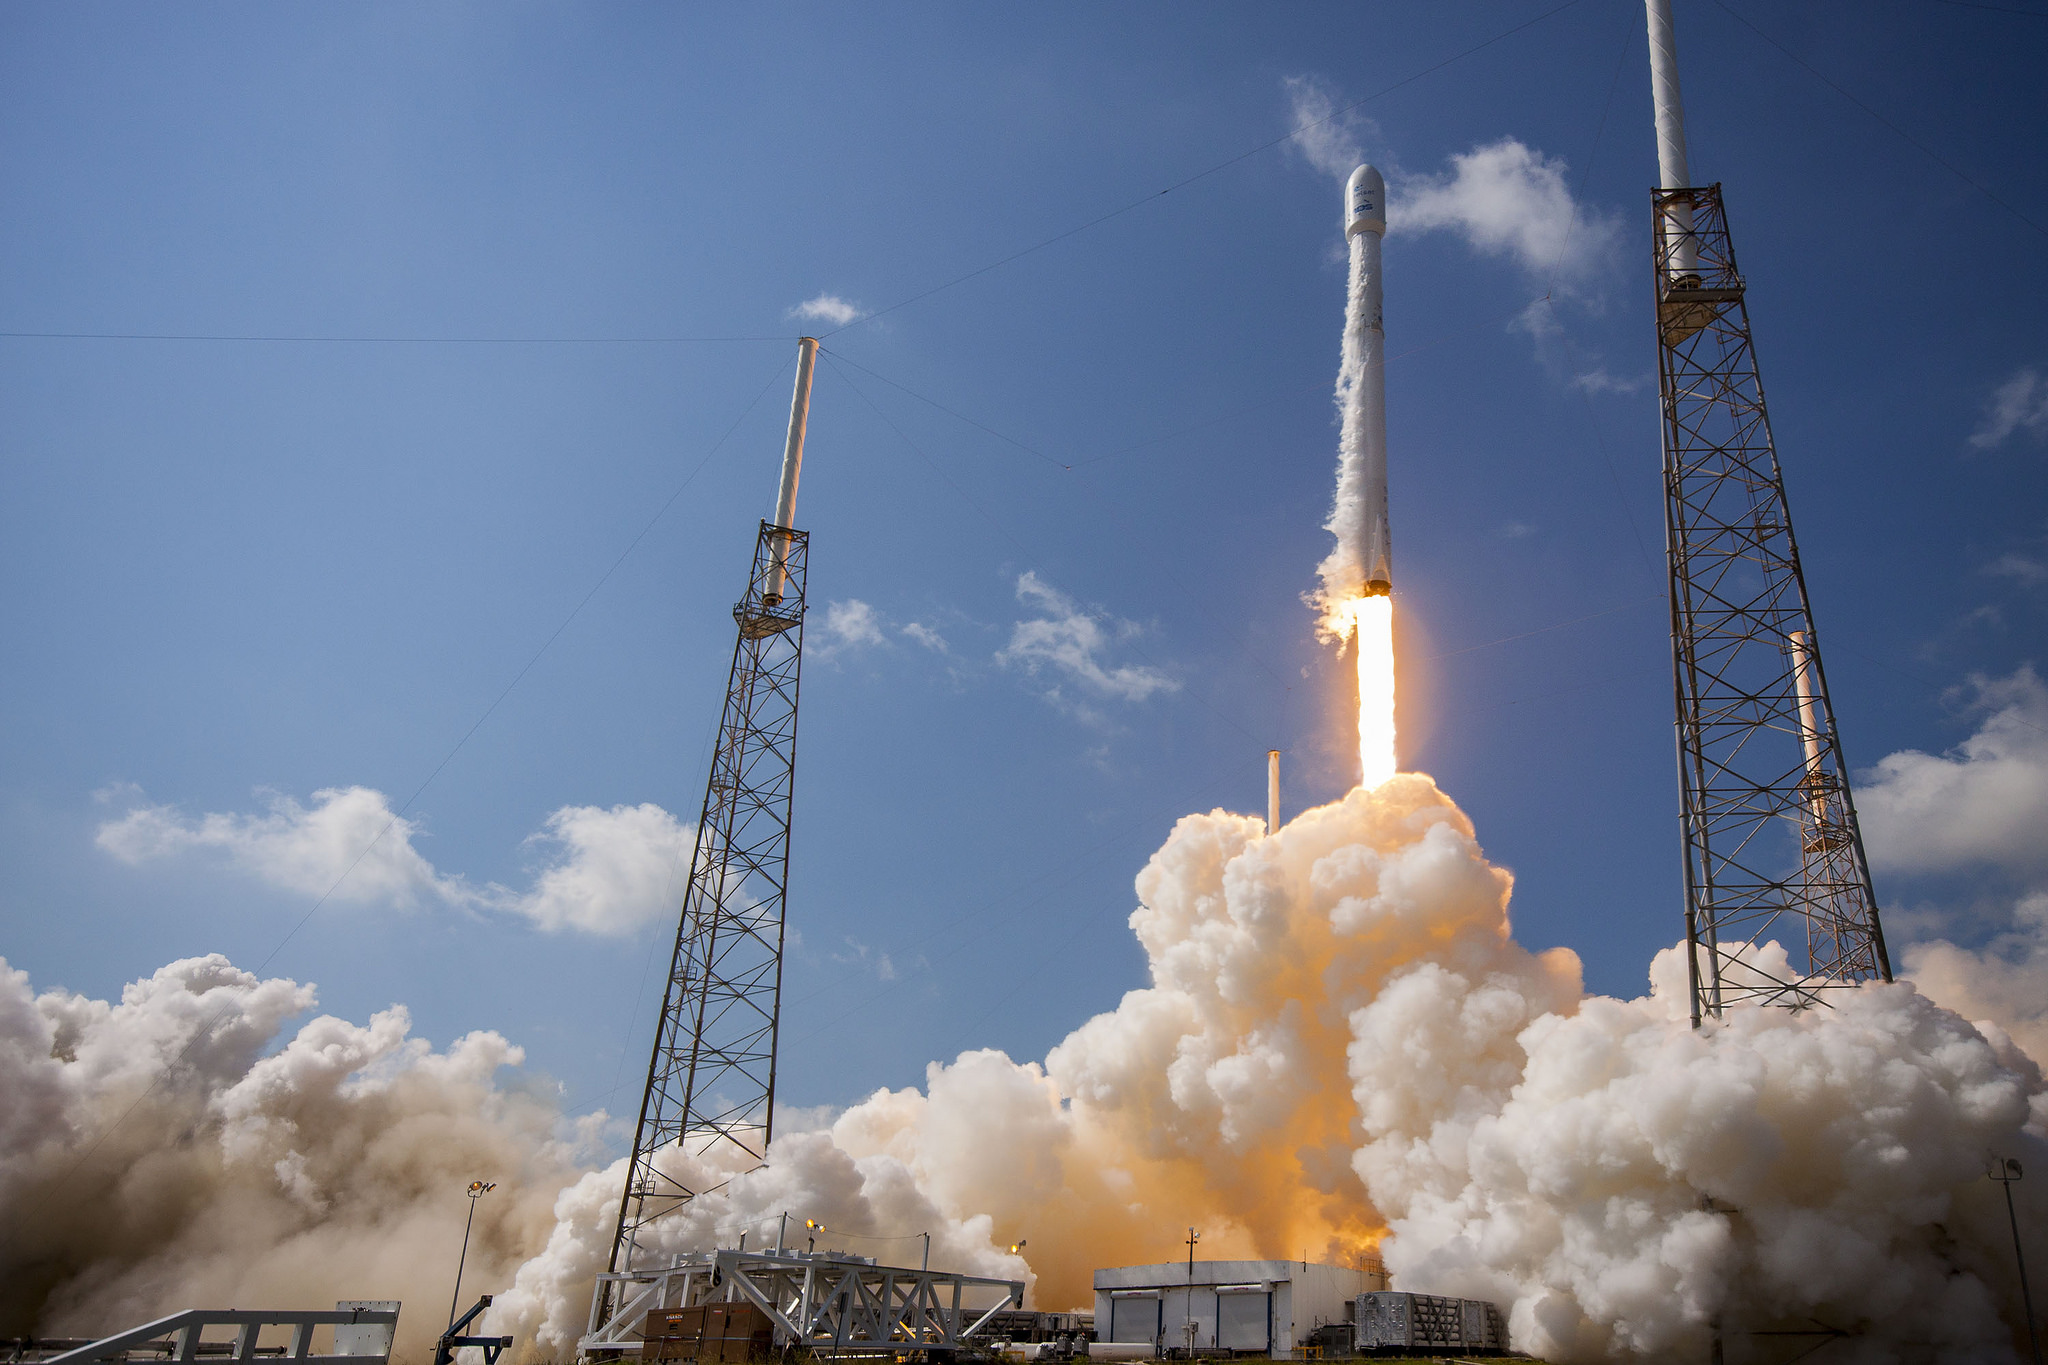 spacex rocket in flight - photo #16